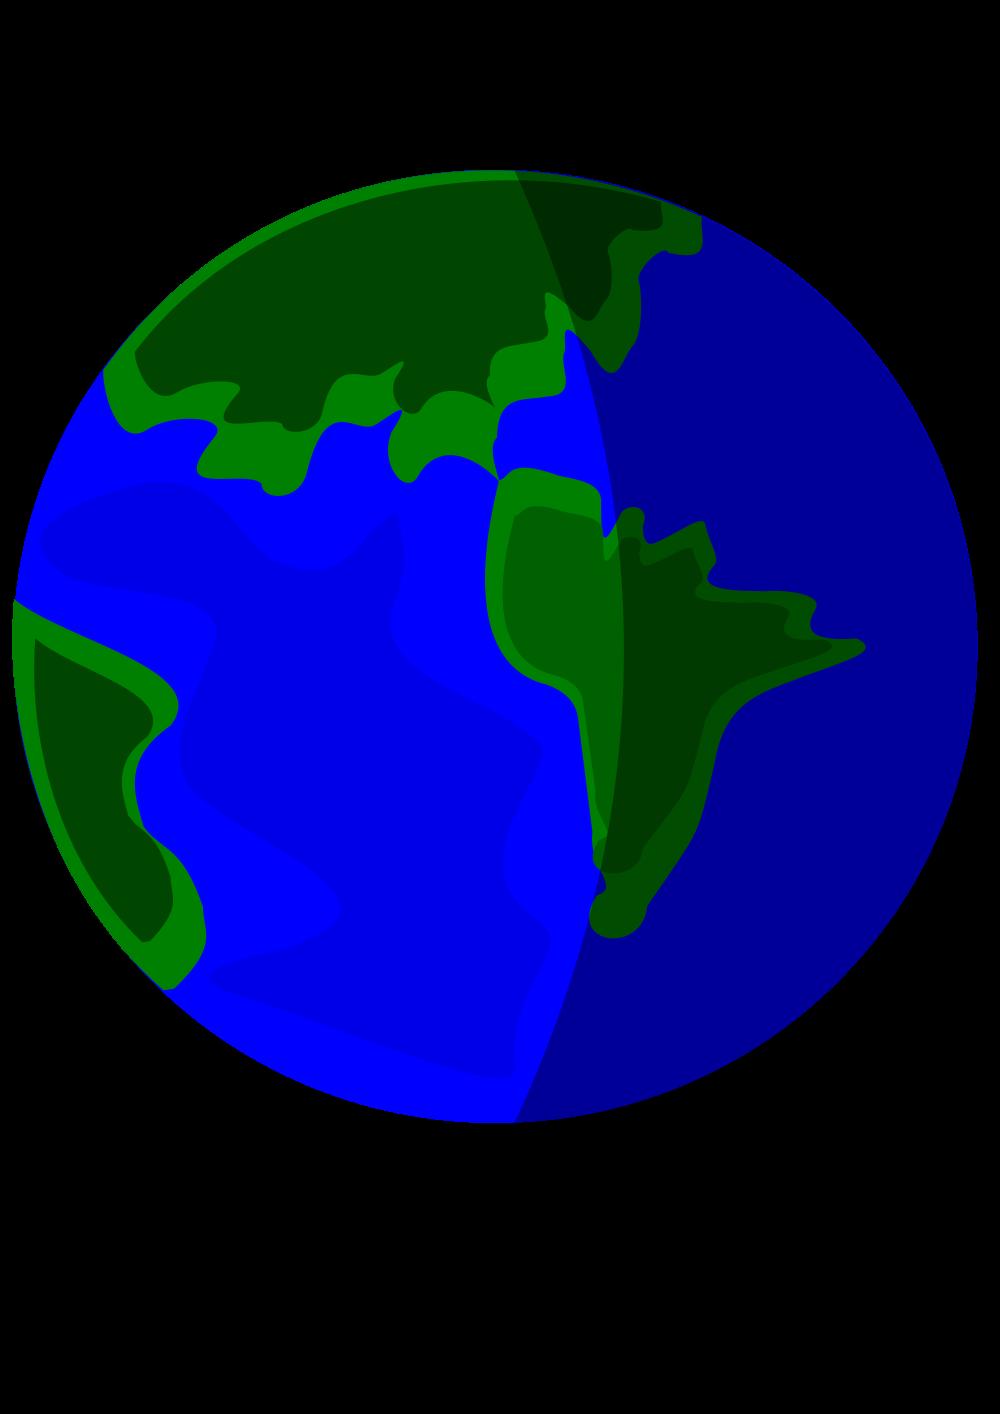 Onlinelabels clip art. Planet clipart tierra